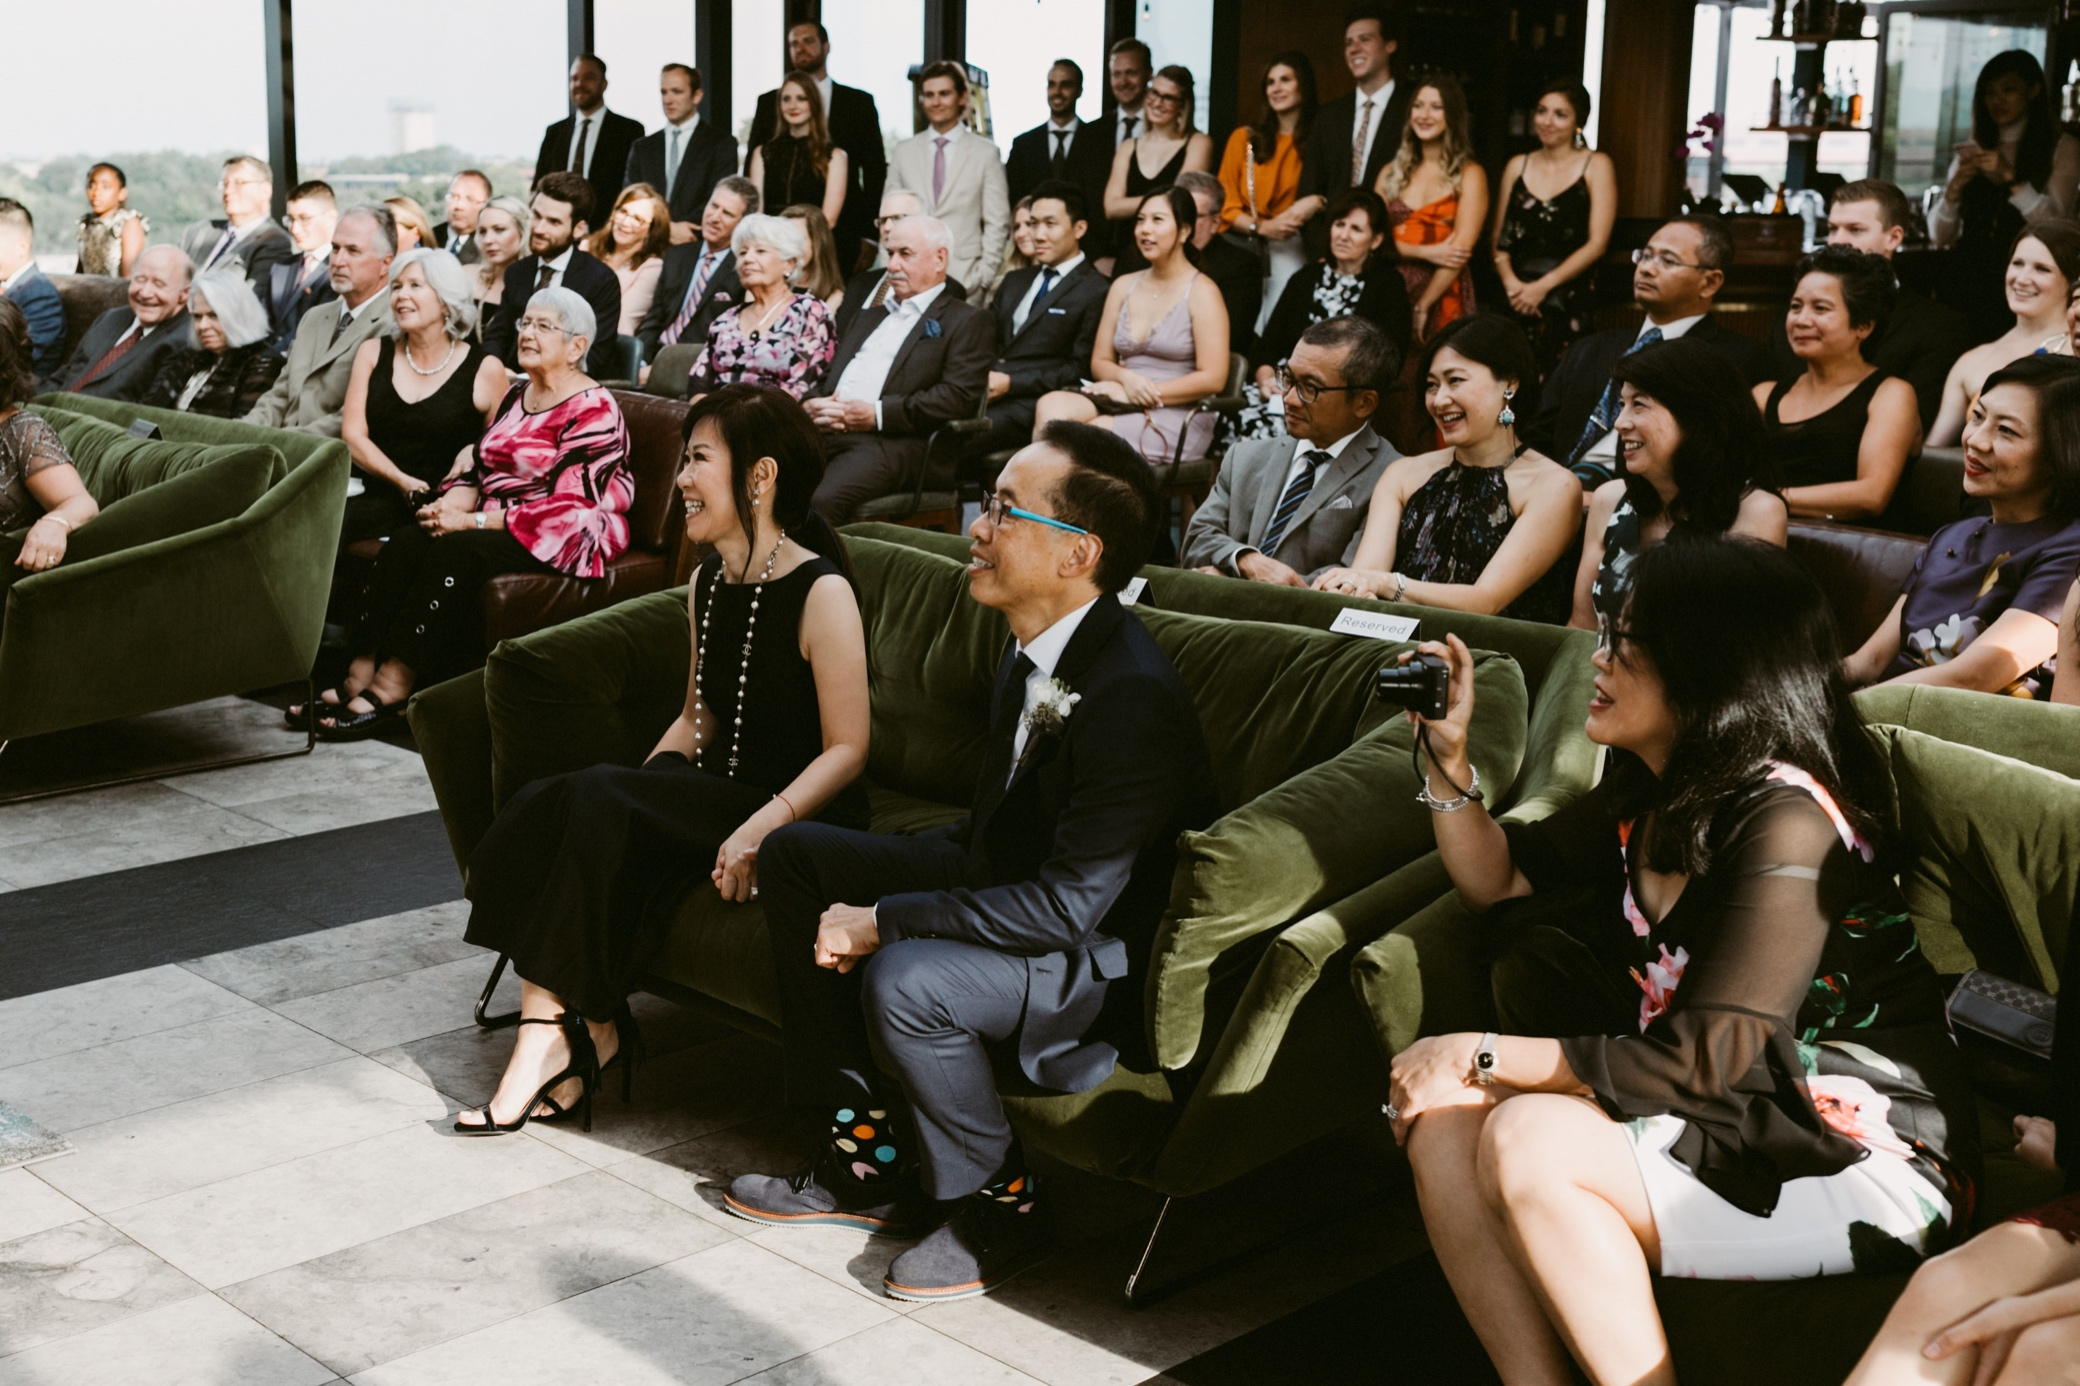 062_The Broadview Hotel Wedding (434 of 913).jpg